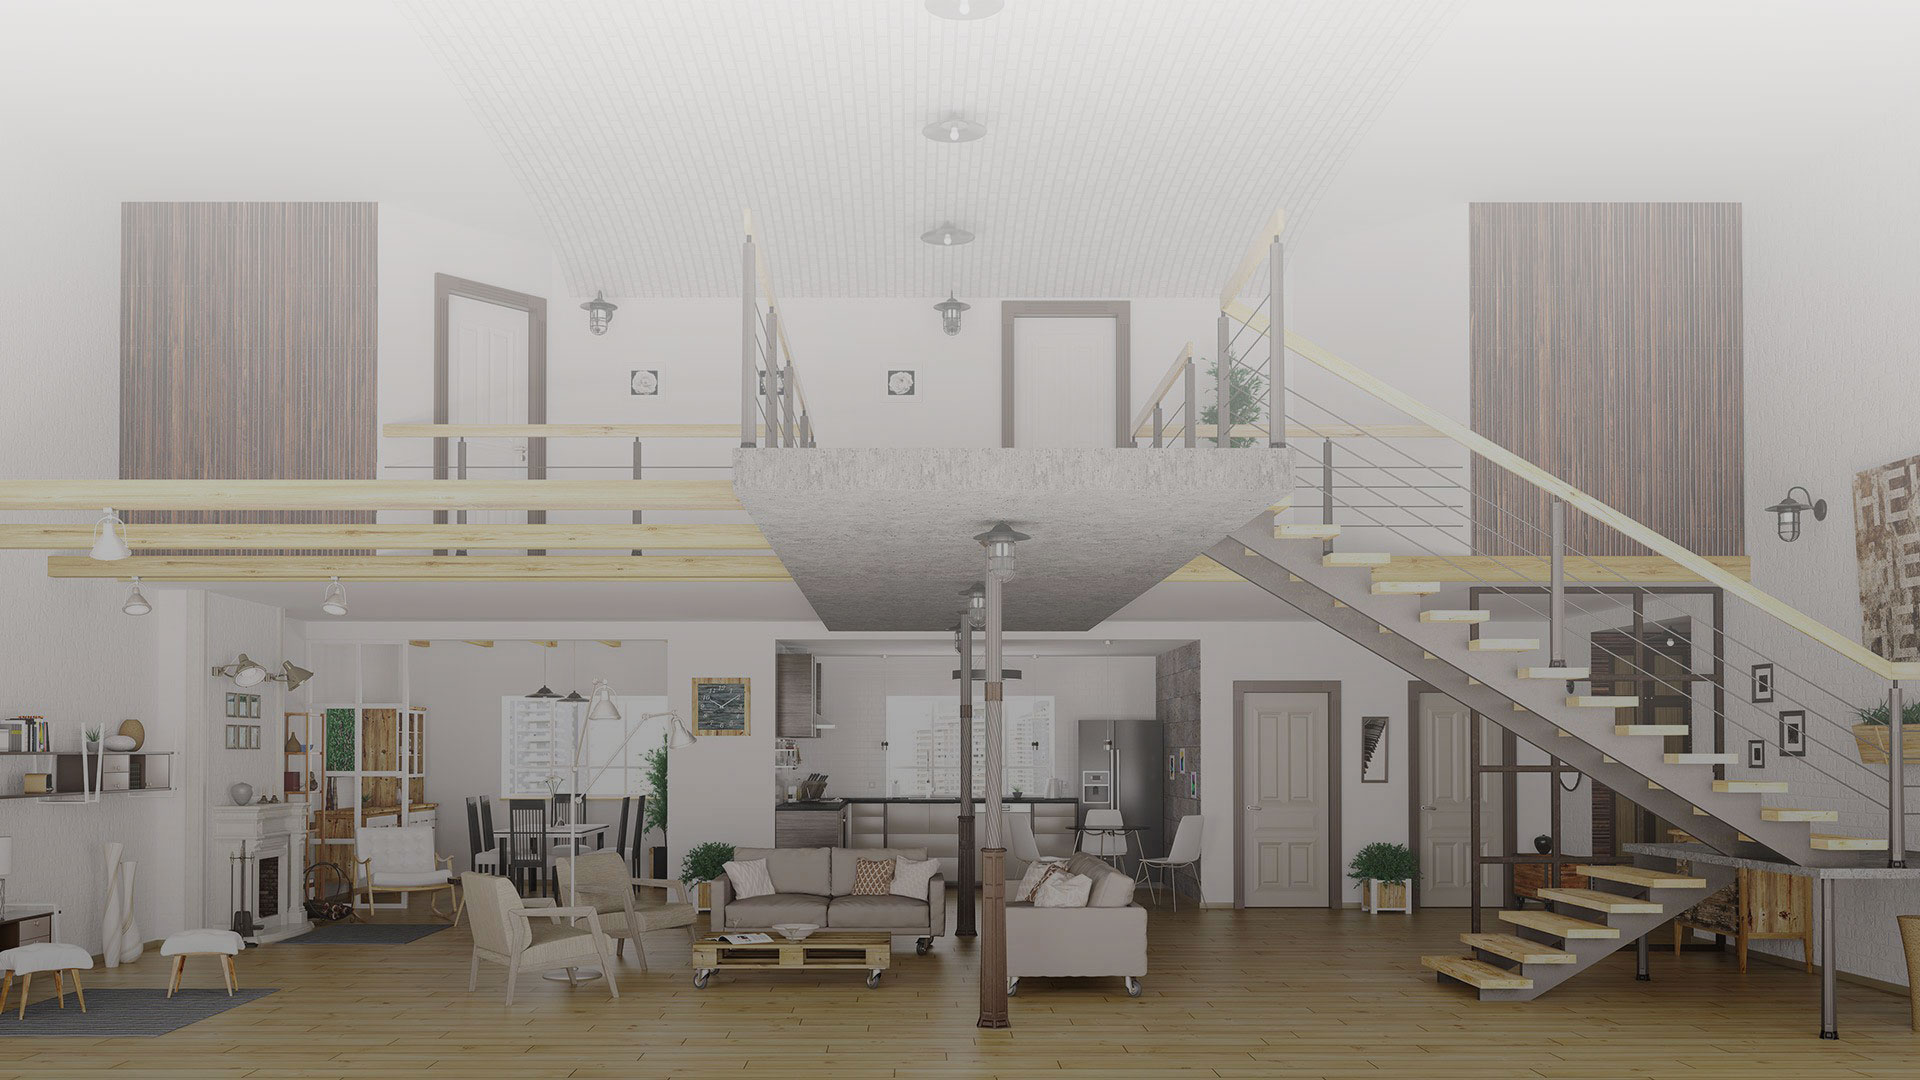 Architect Design Build And Church Architecture In St